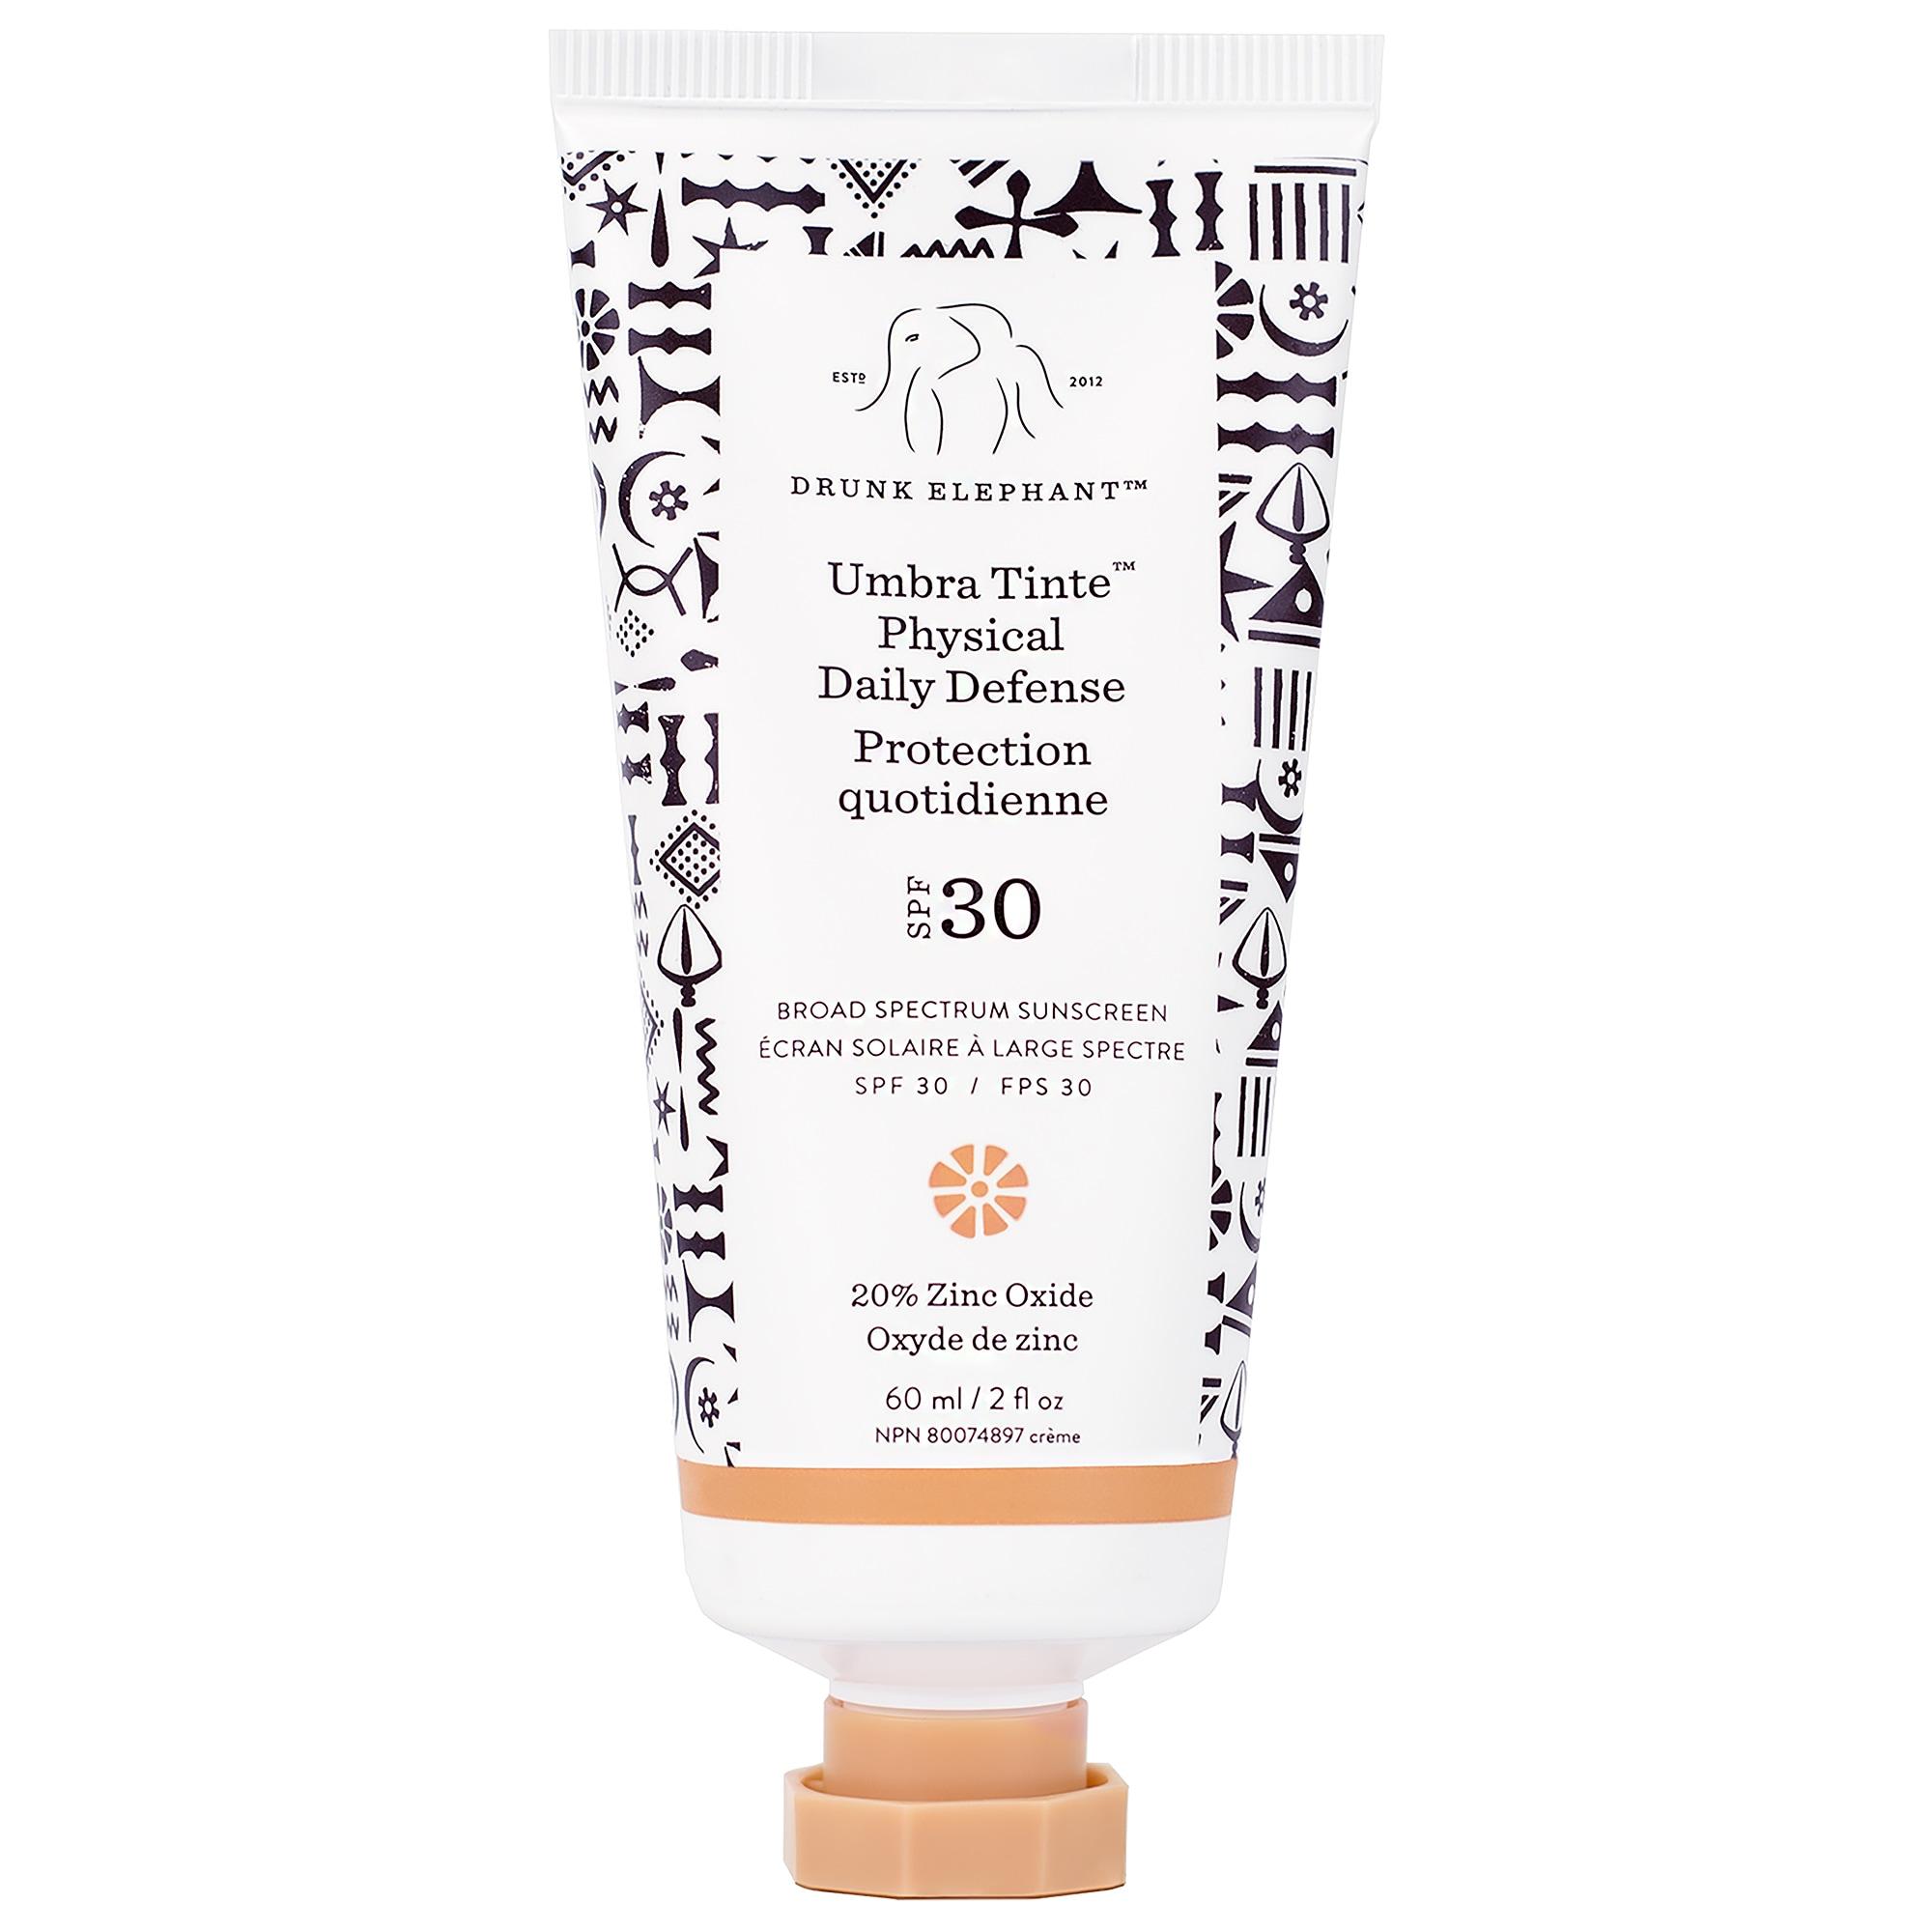 Drunk Elephant - Umbra Tinte Physical Daily Defense Broad Spectrum Sunscreen SPF 30